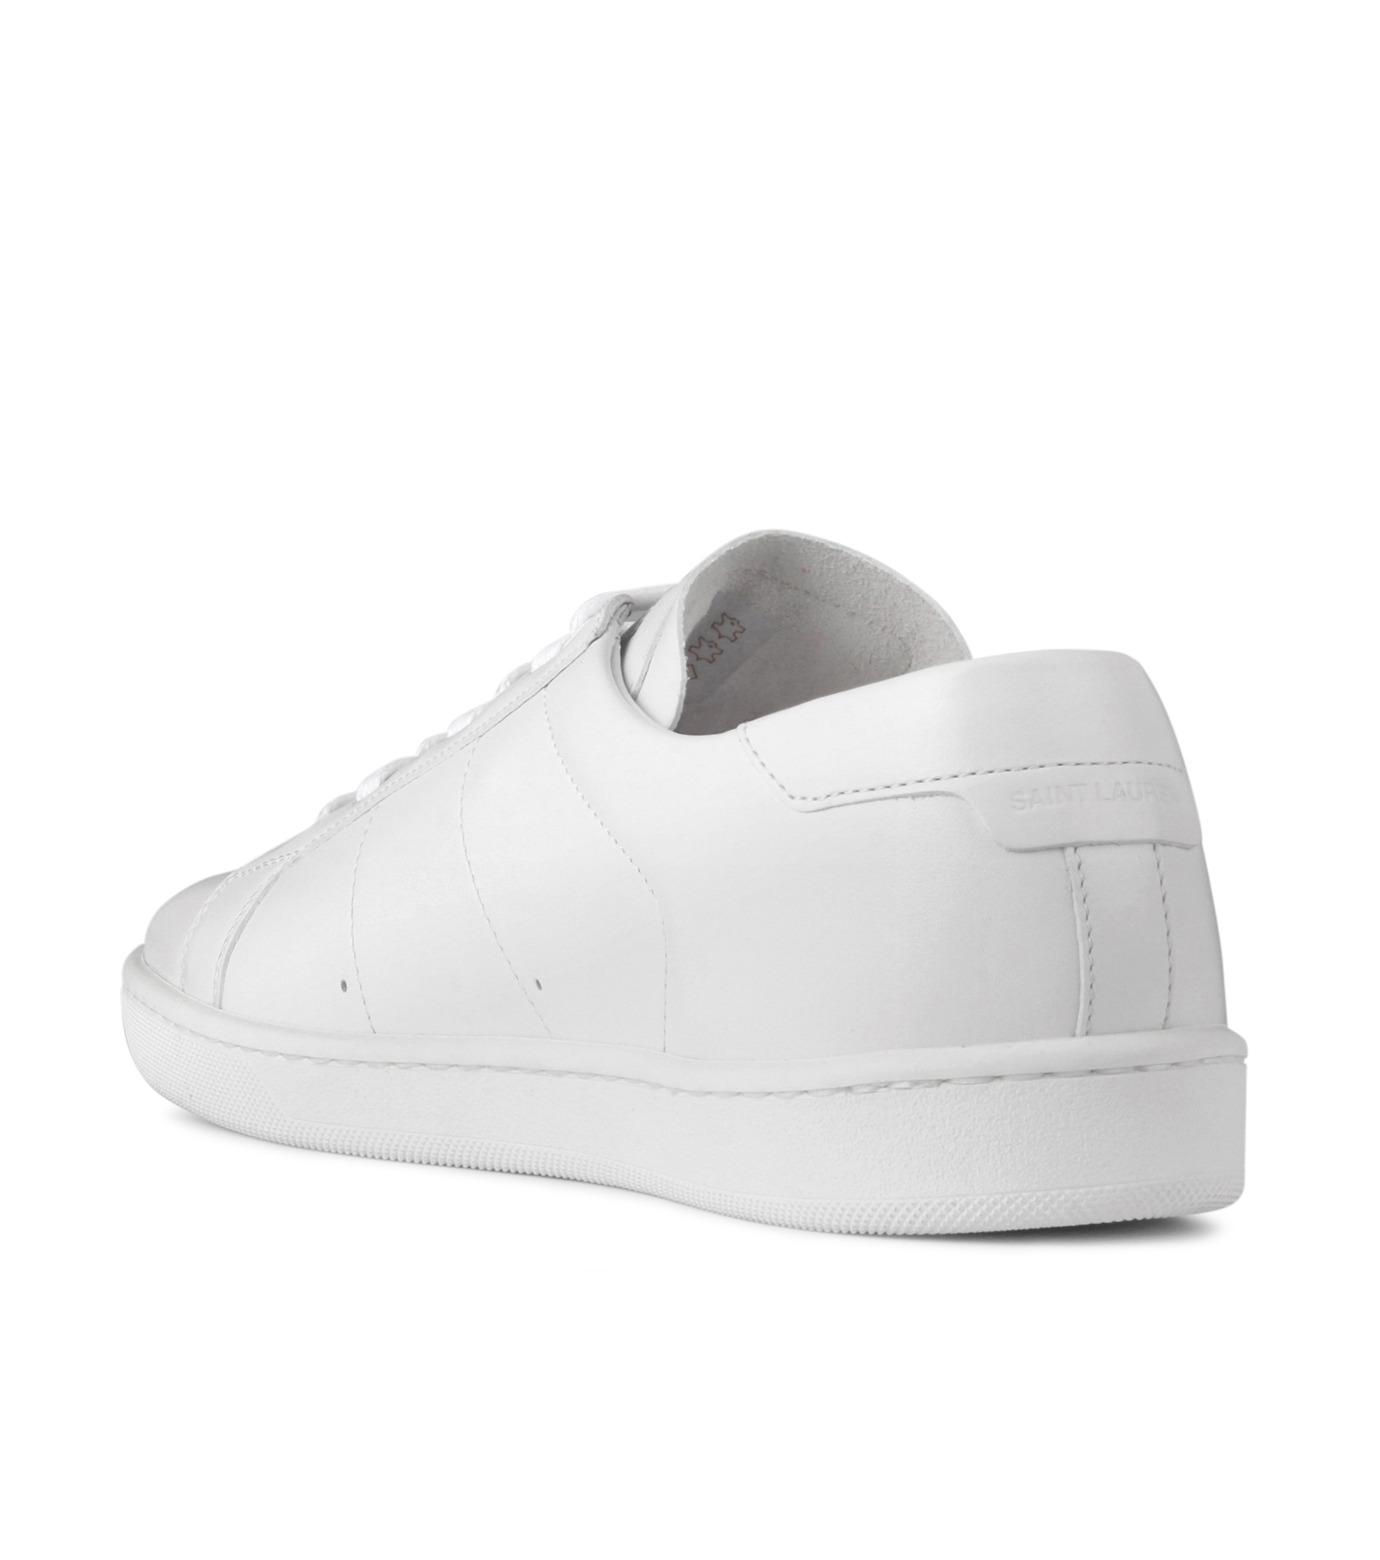 SAINT LAURENT(サンローラン)のLow Top Sneaker-WHITE-336250-AQI00-4 拡大詳細画像2